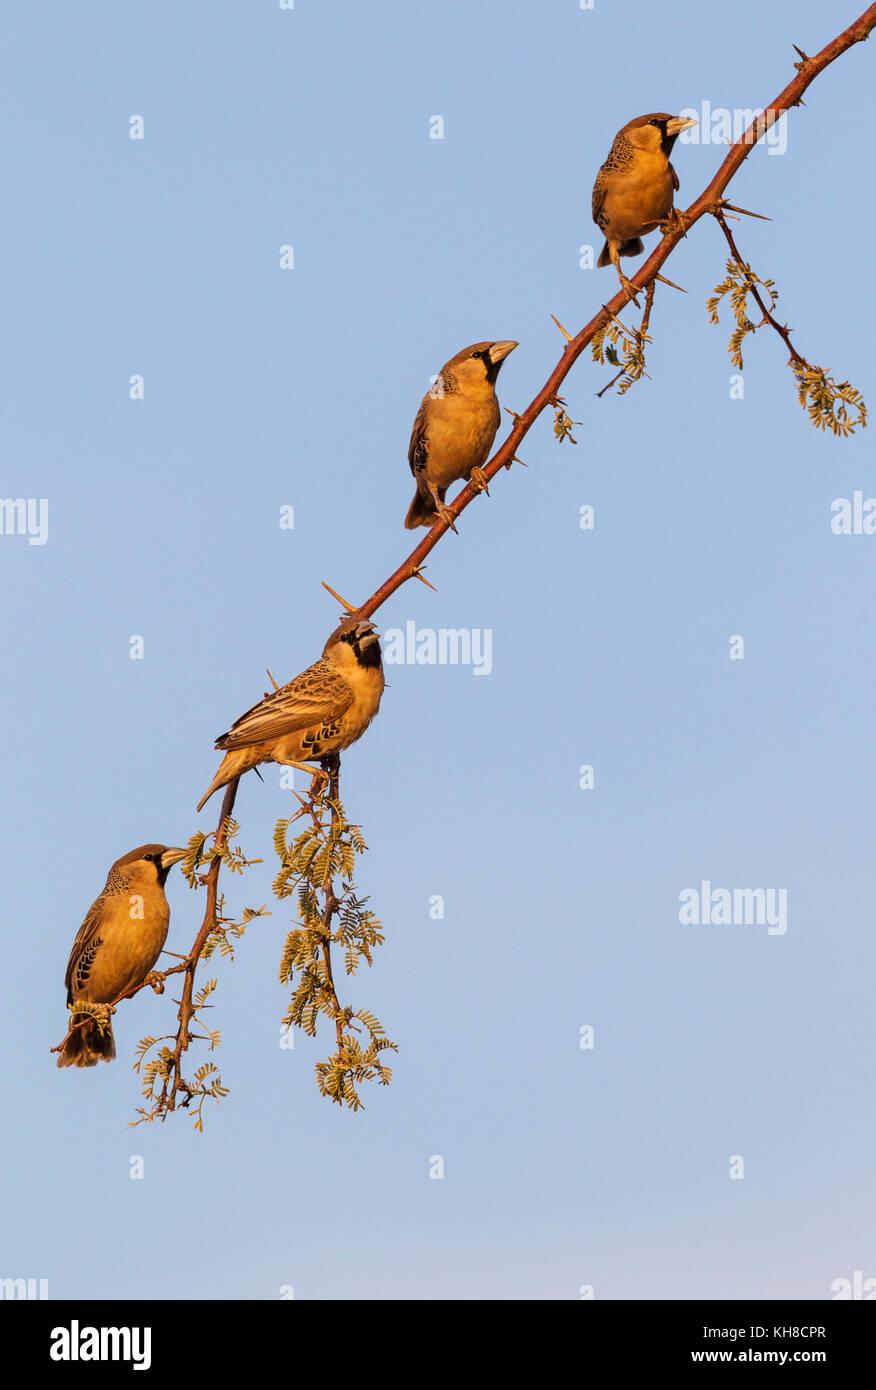 Sociable Weaver (Philetairus socius), males on a twig of camelthorn tree (Acacia erioloba), Kalahari Desert - Stock Image